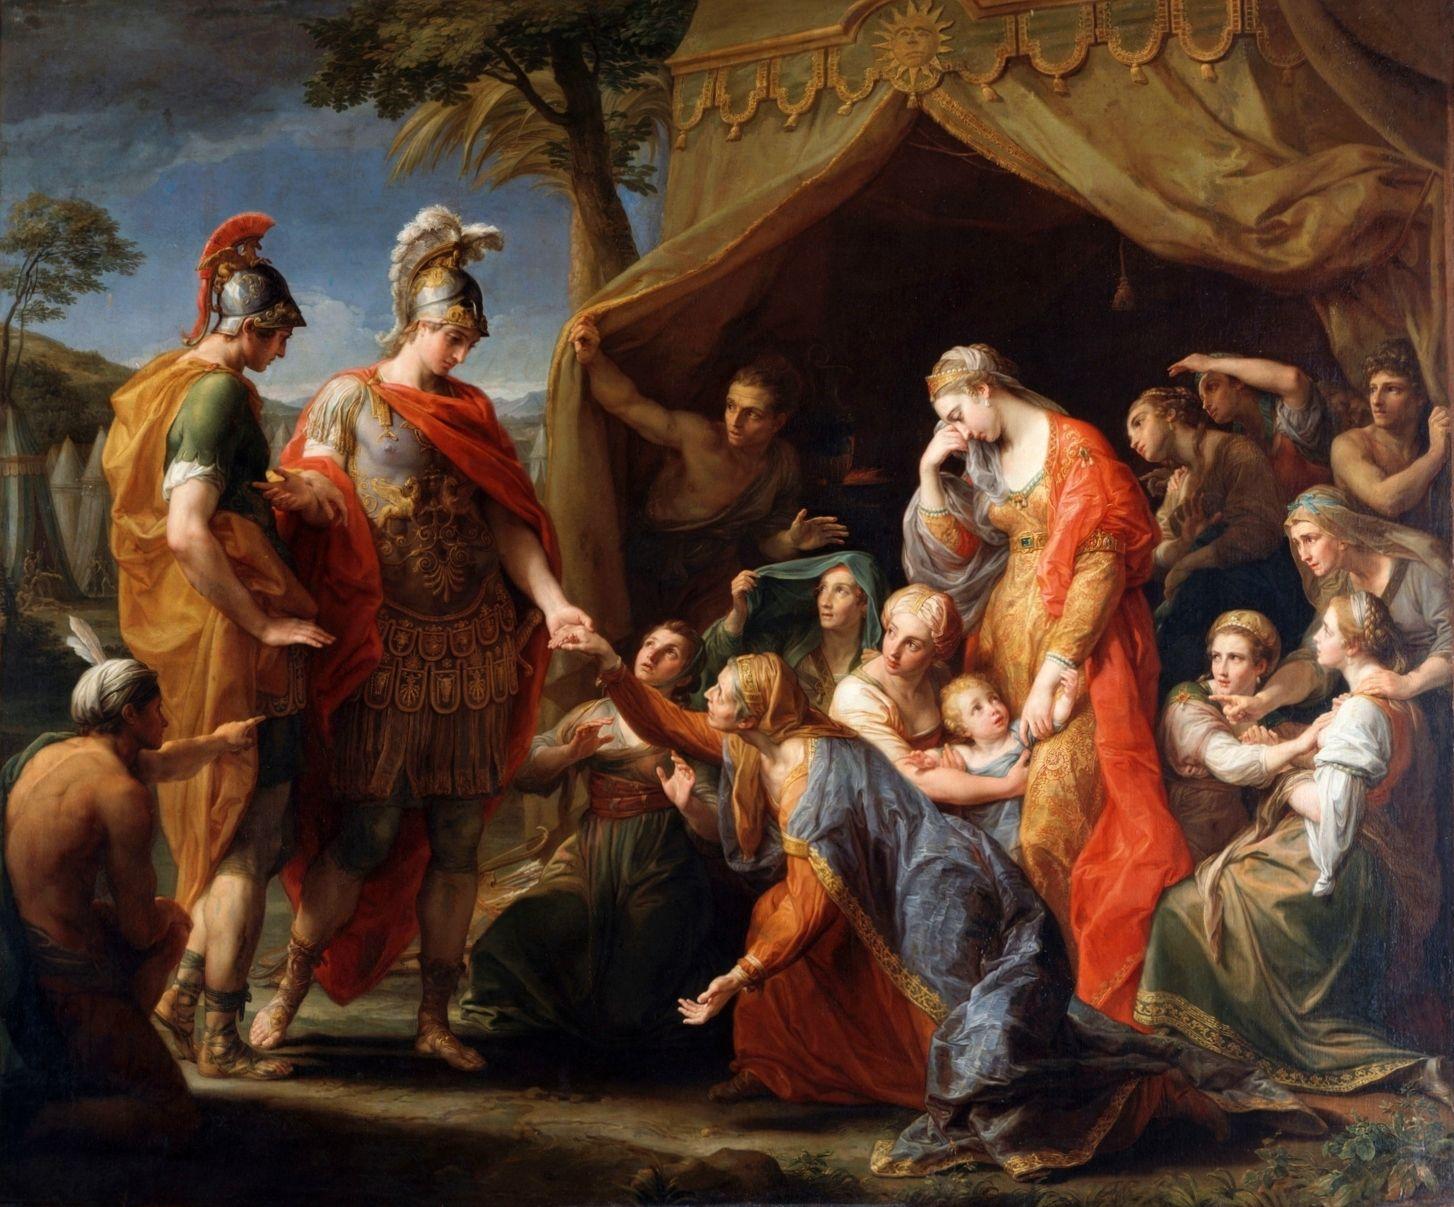 Batoni Pompeo 1775 La clemence d'Alexandre